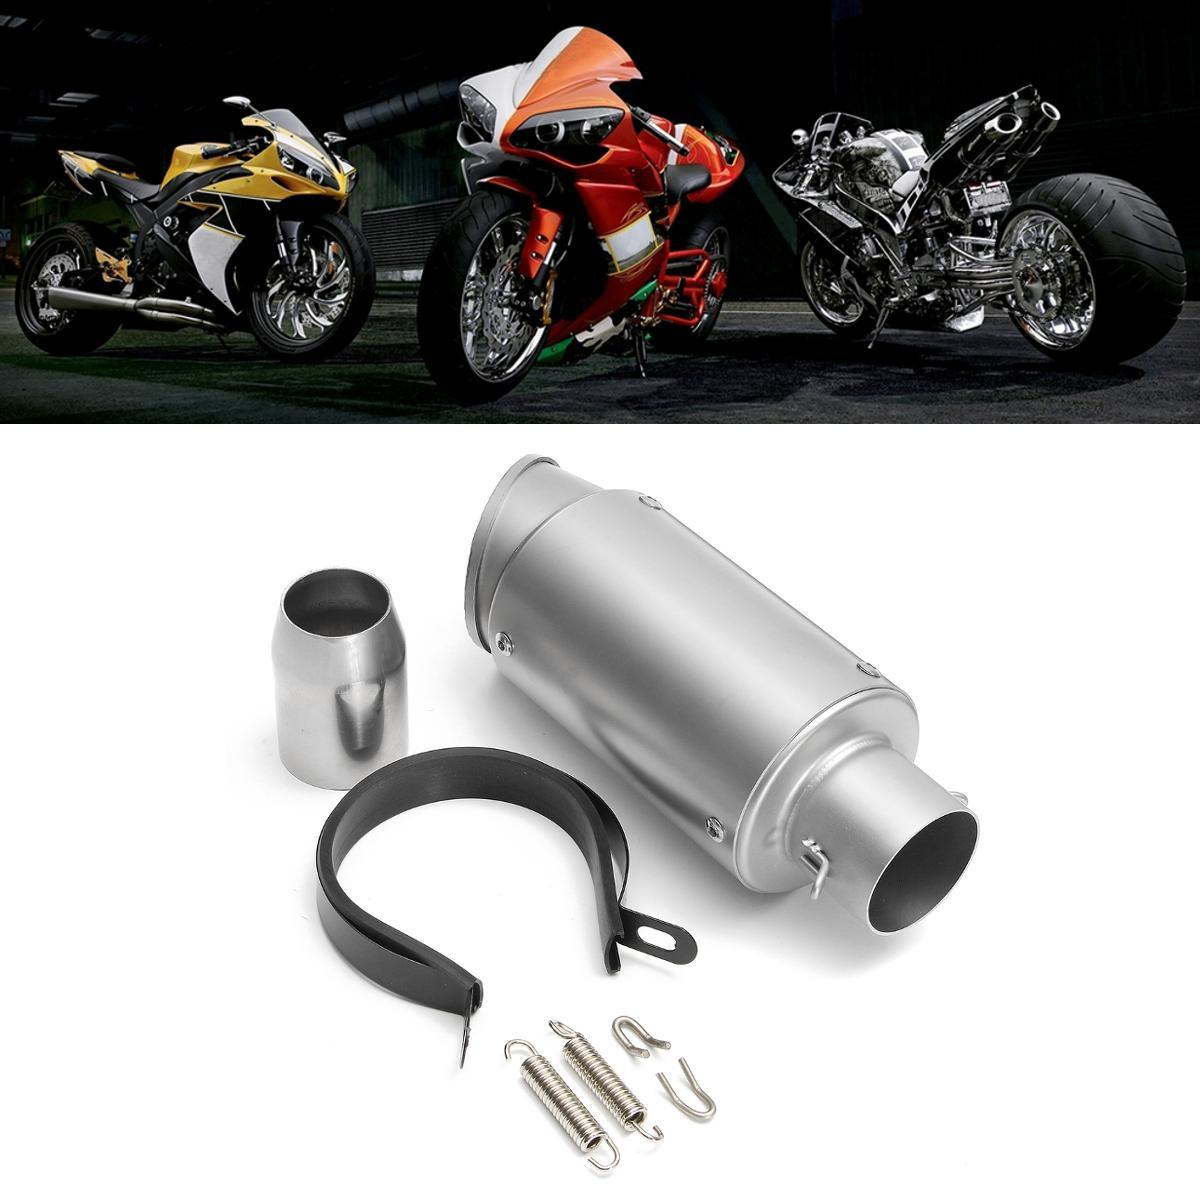 RTG HEAVY DUTY CAR /& MOTORCYCLE EXHAUST HEAT WRAP 10M INCLUDING S//STEEL CLIPS